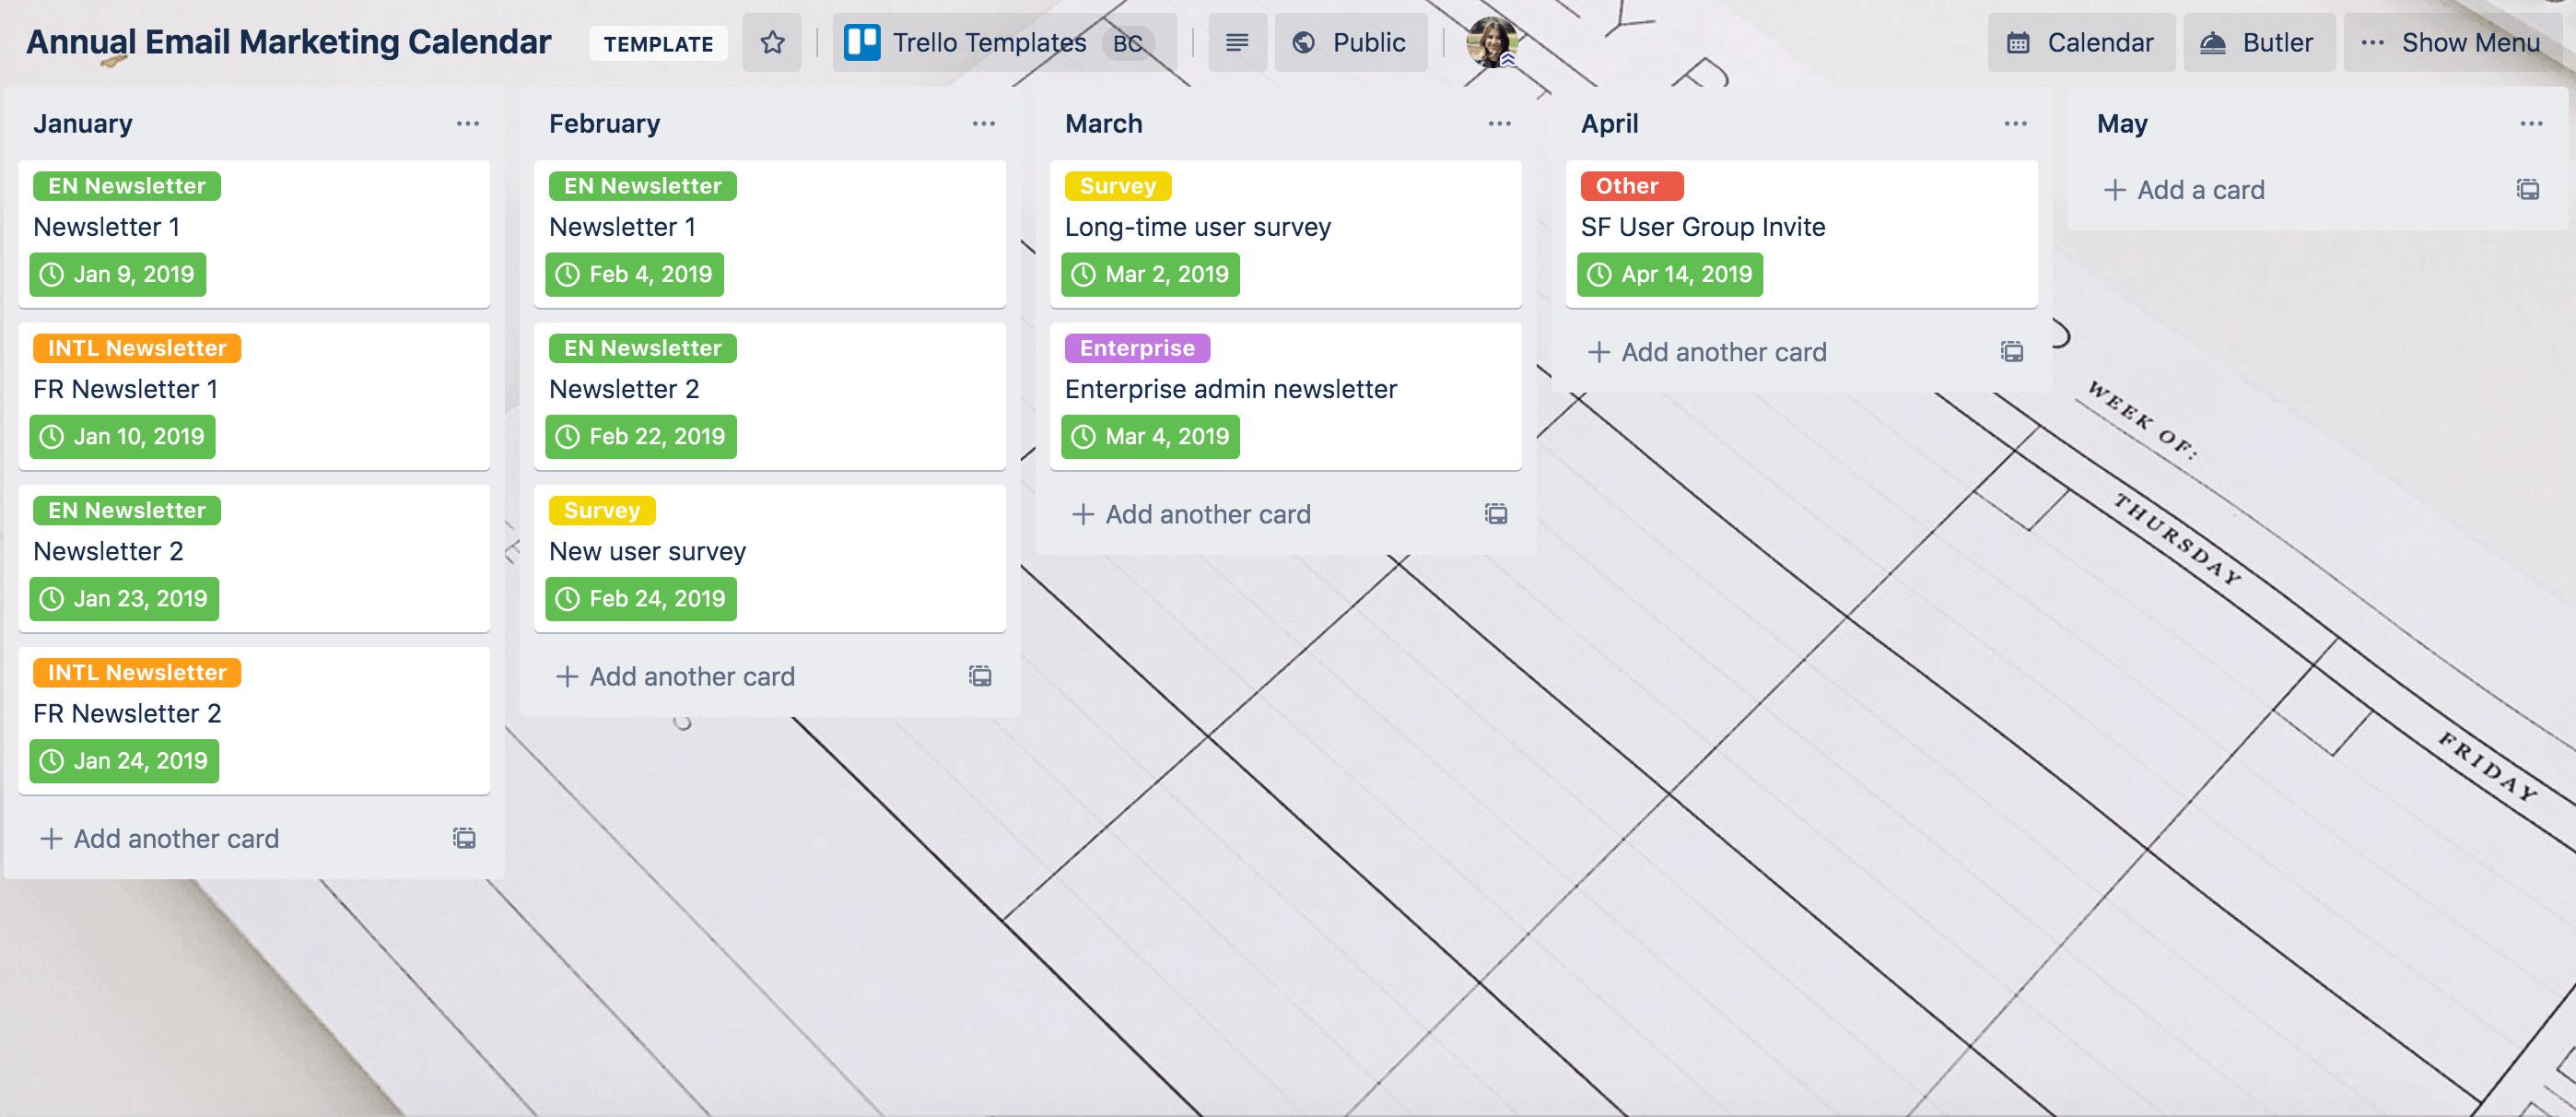 email-send-calendar-template